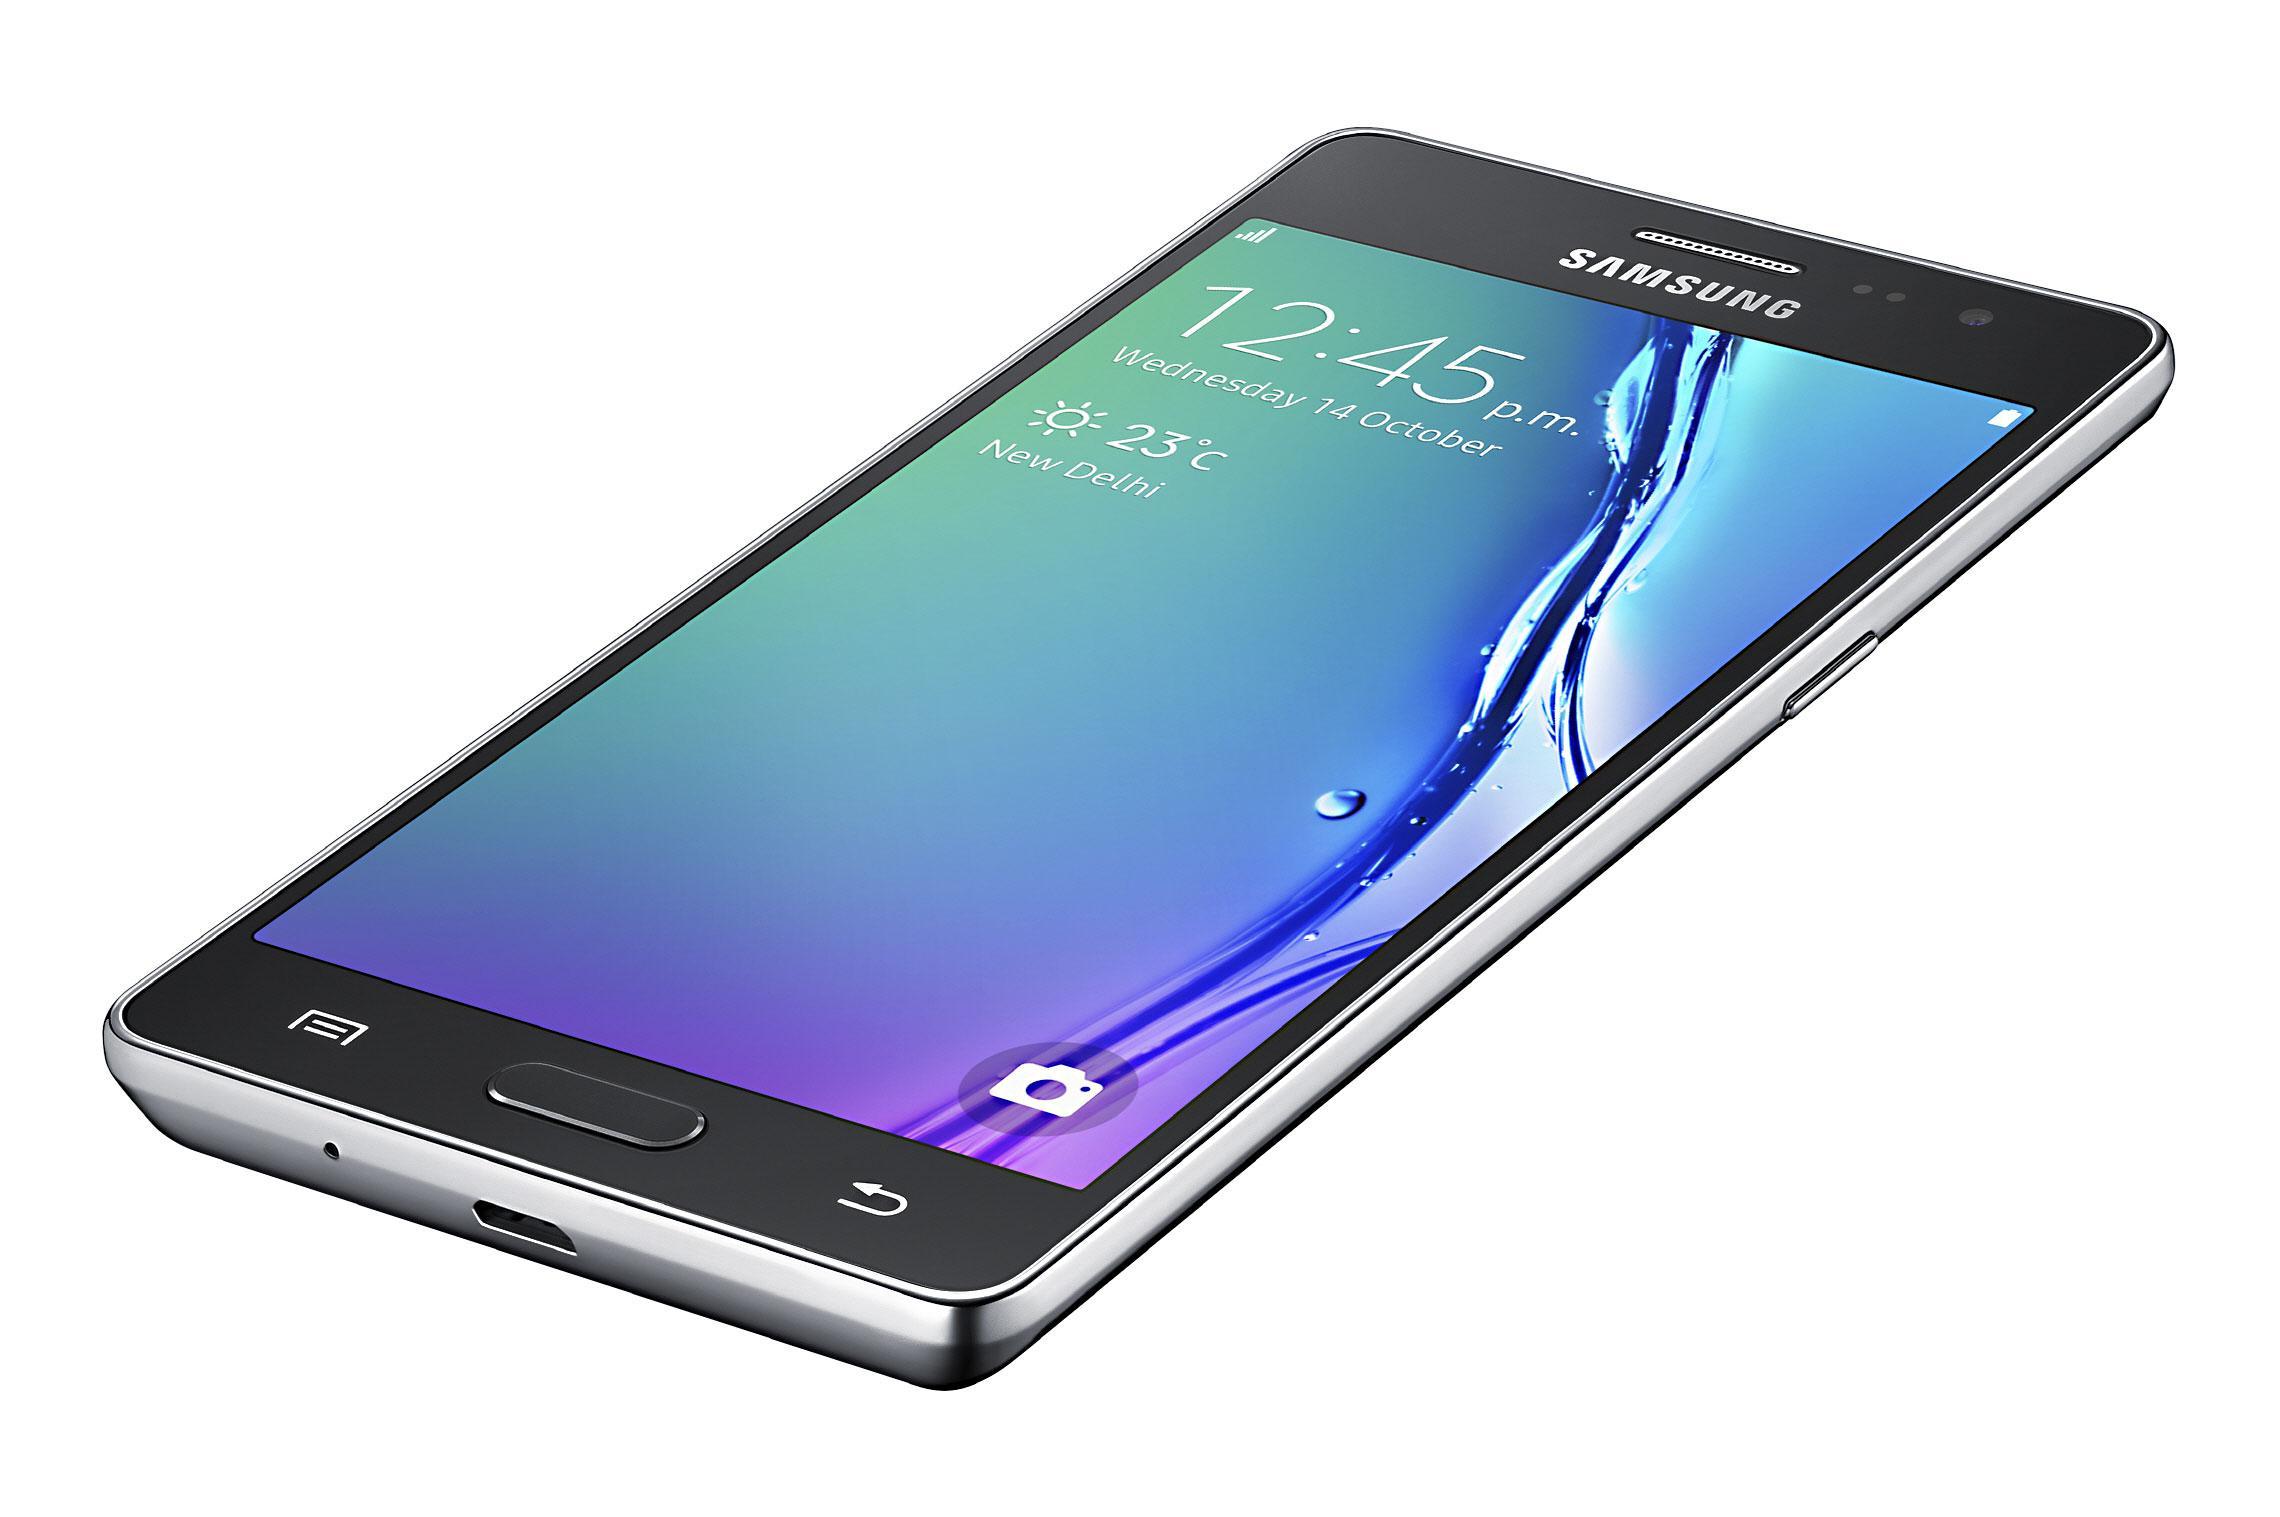 Samsung Z3 Tizen negro